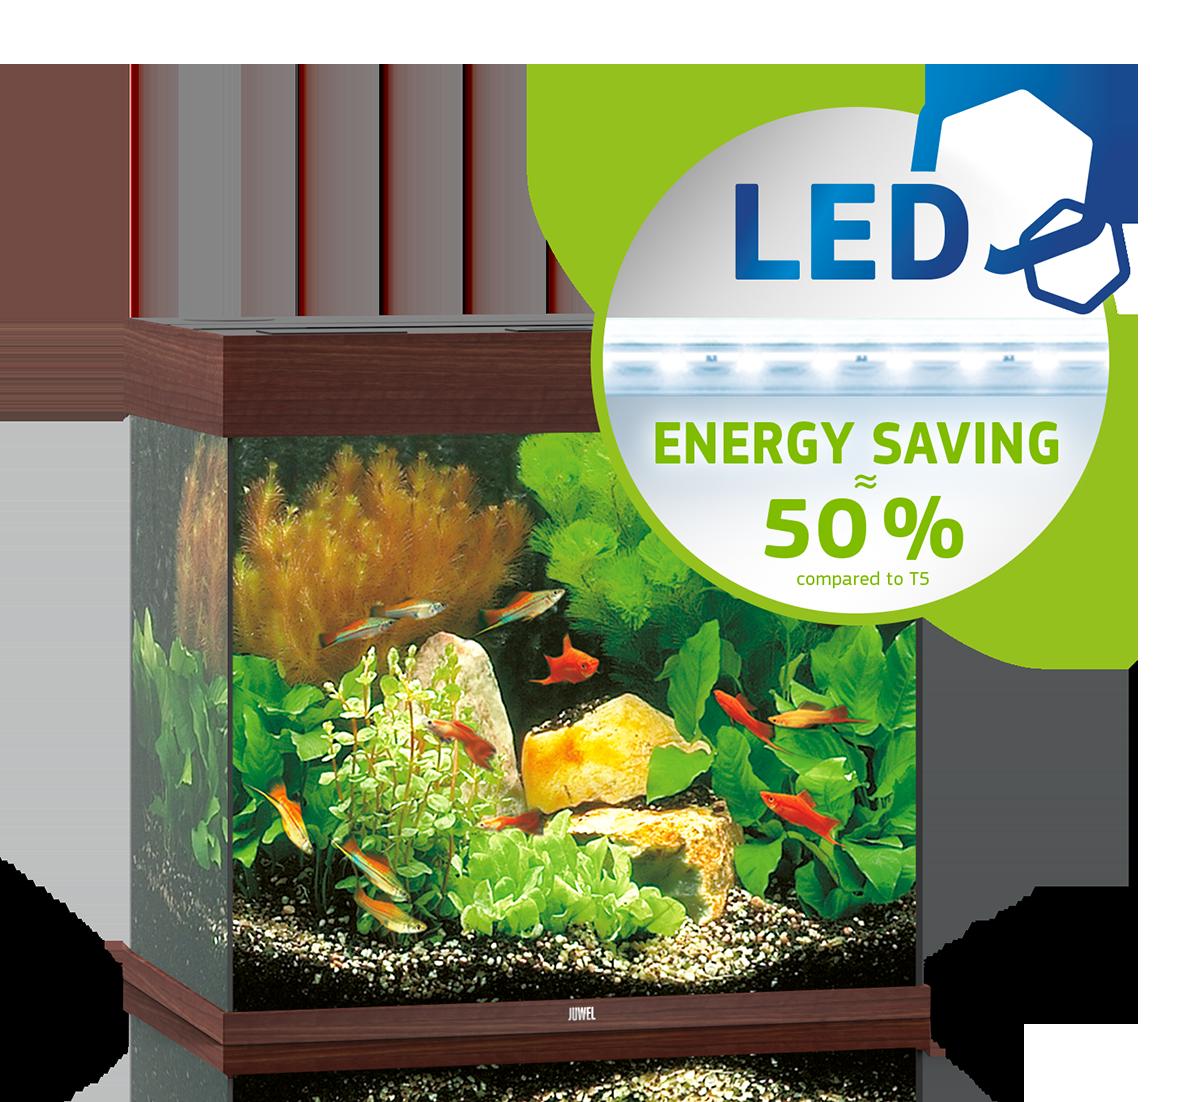 JUWEL LIDO 120 LED по выгодной цене в супермаркетах Аква Лого!